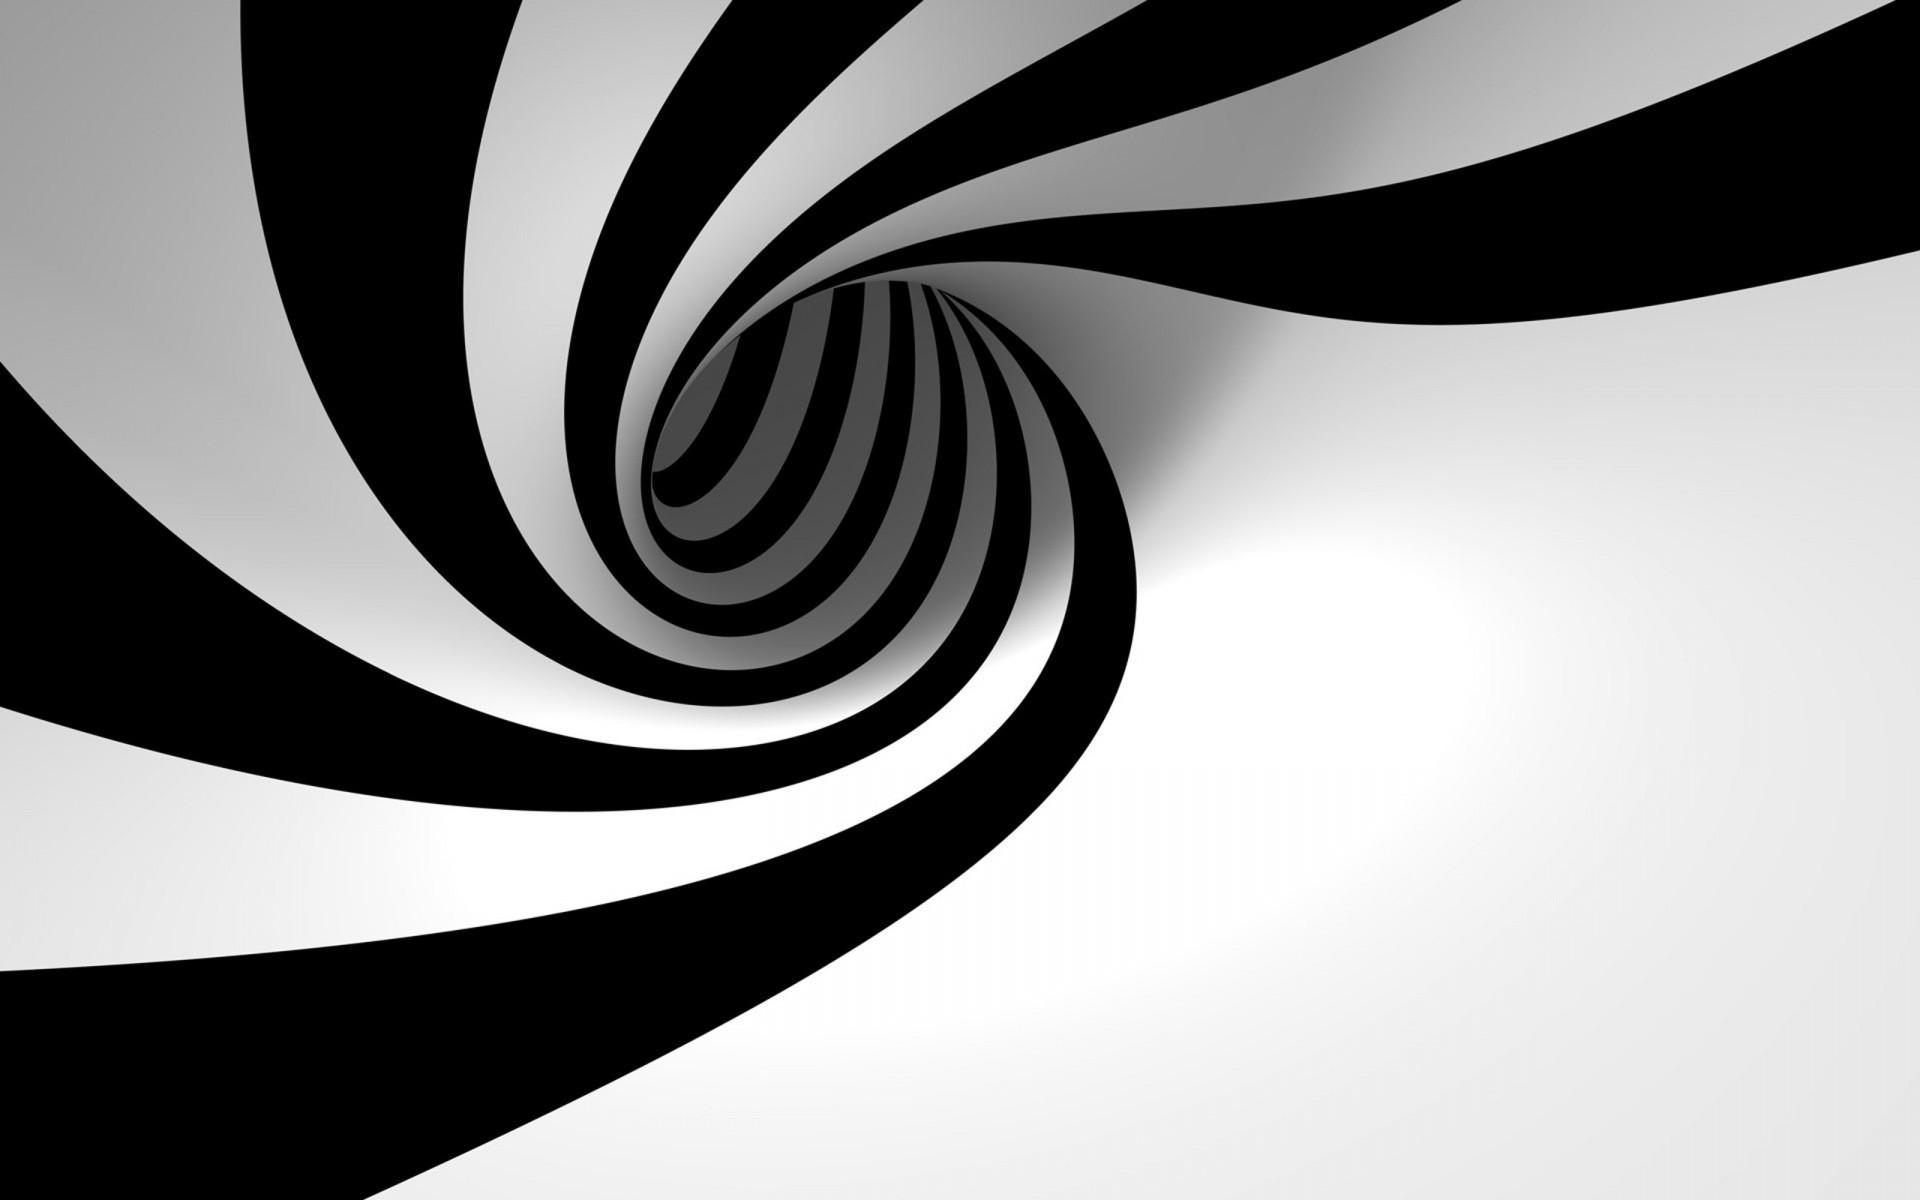 Black & White Background 6